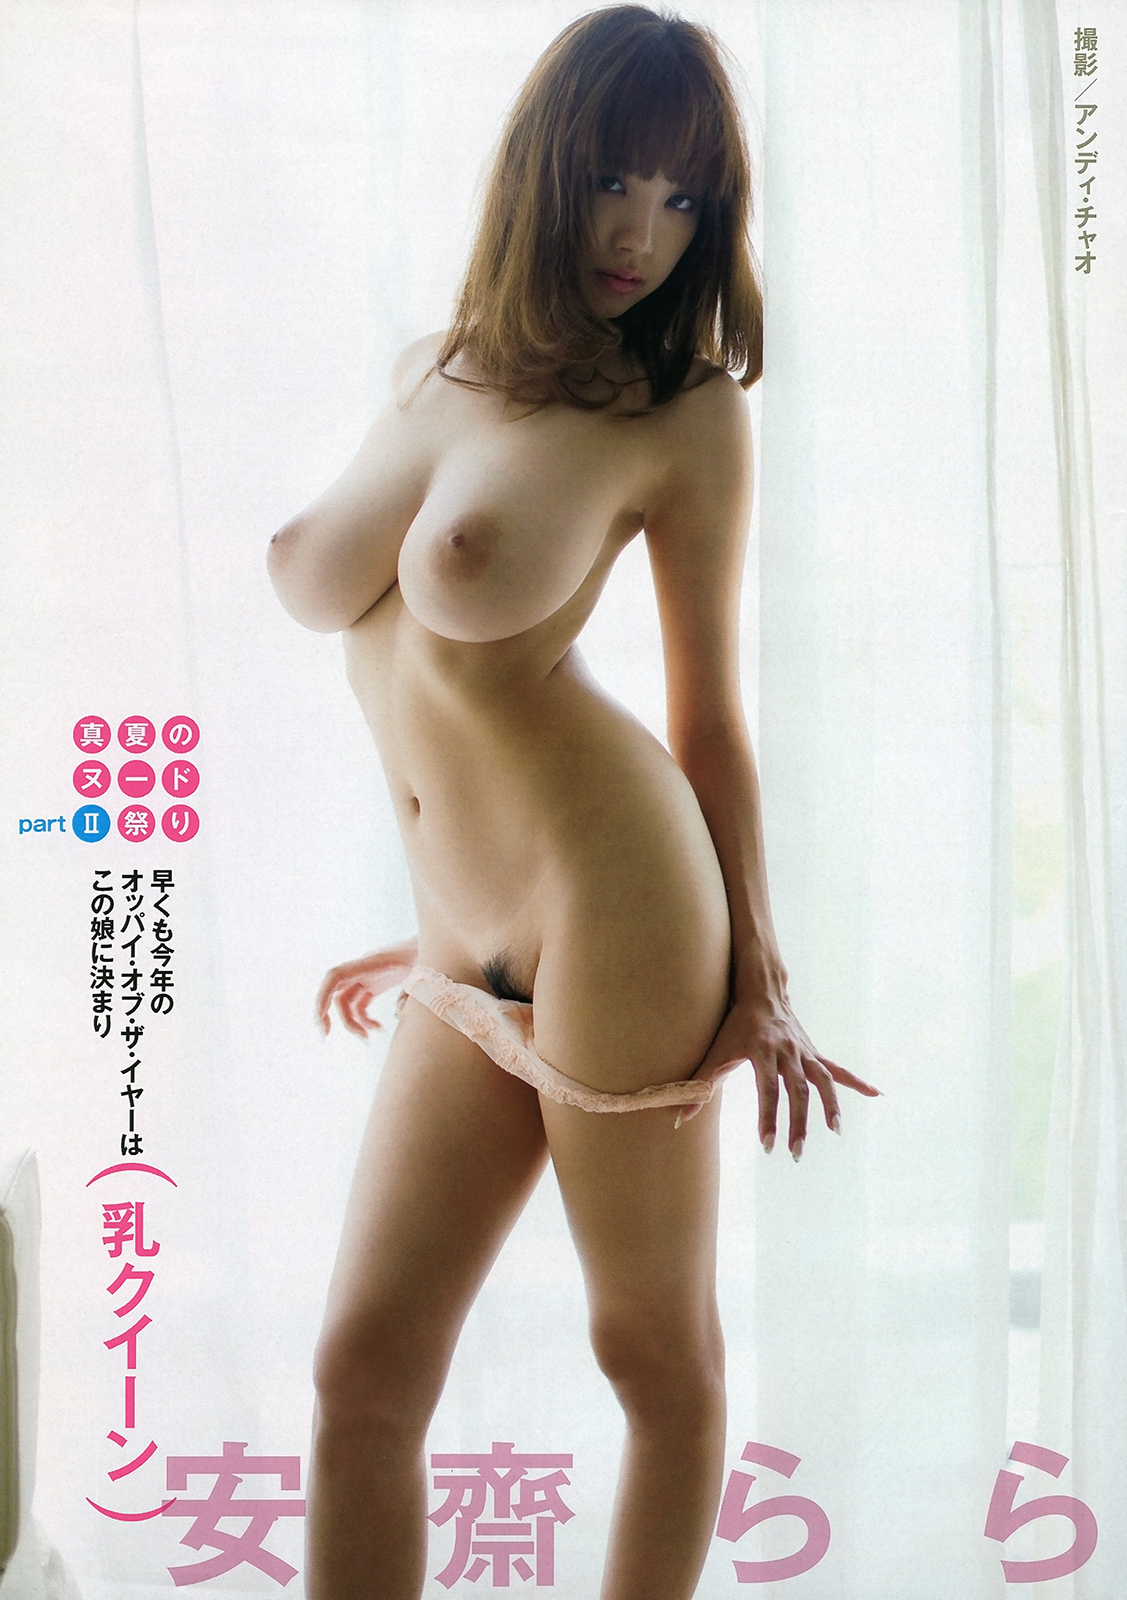 image http://scanlover.com/assets/images/344-AXJrwh9xMI2sbgN1.jpeg